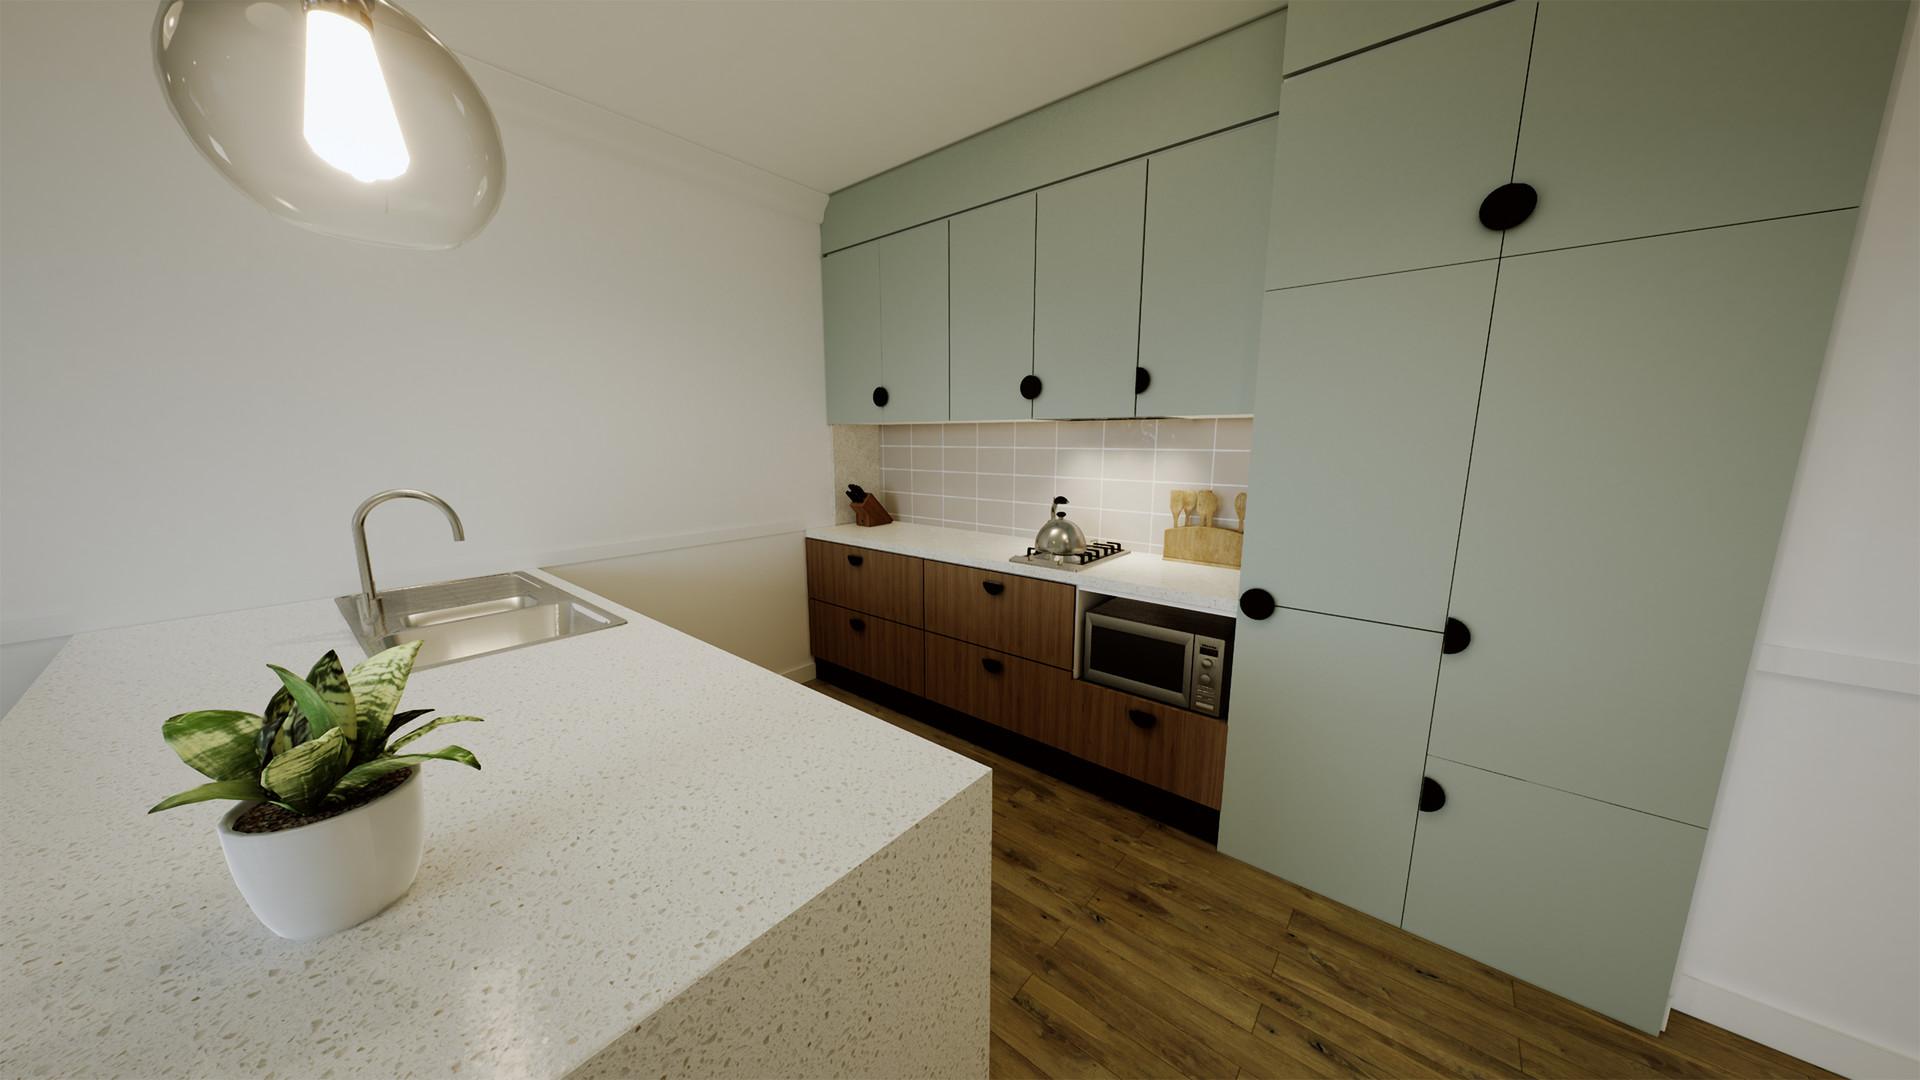 Jordan younie kitchen